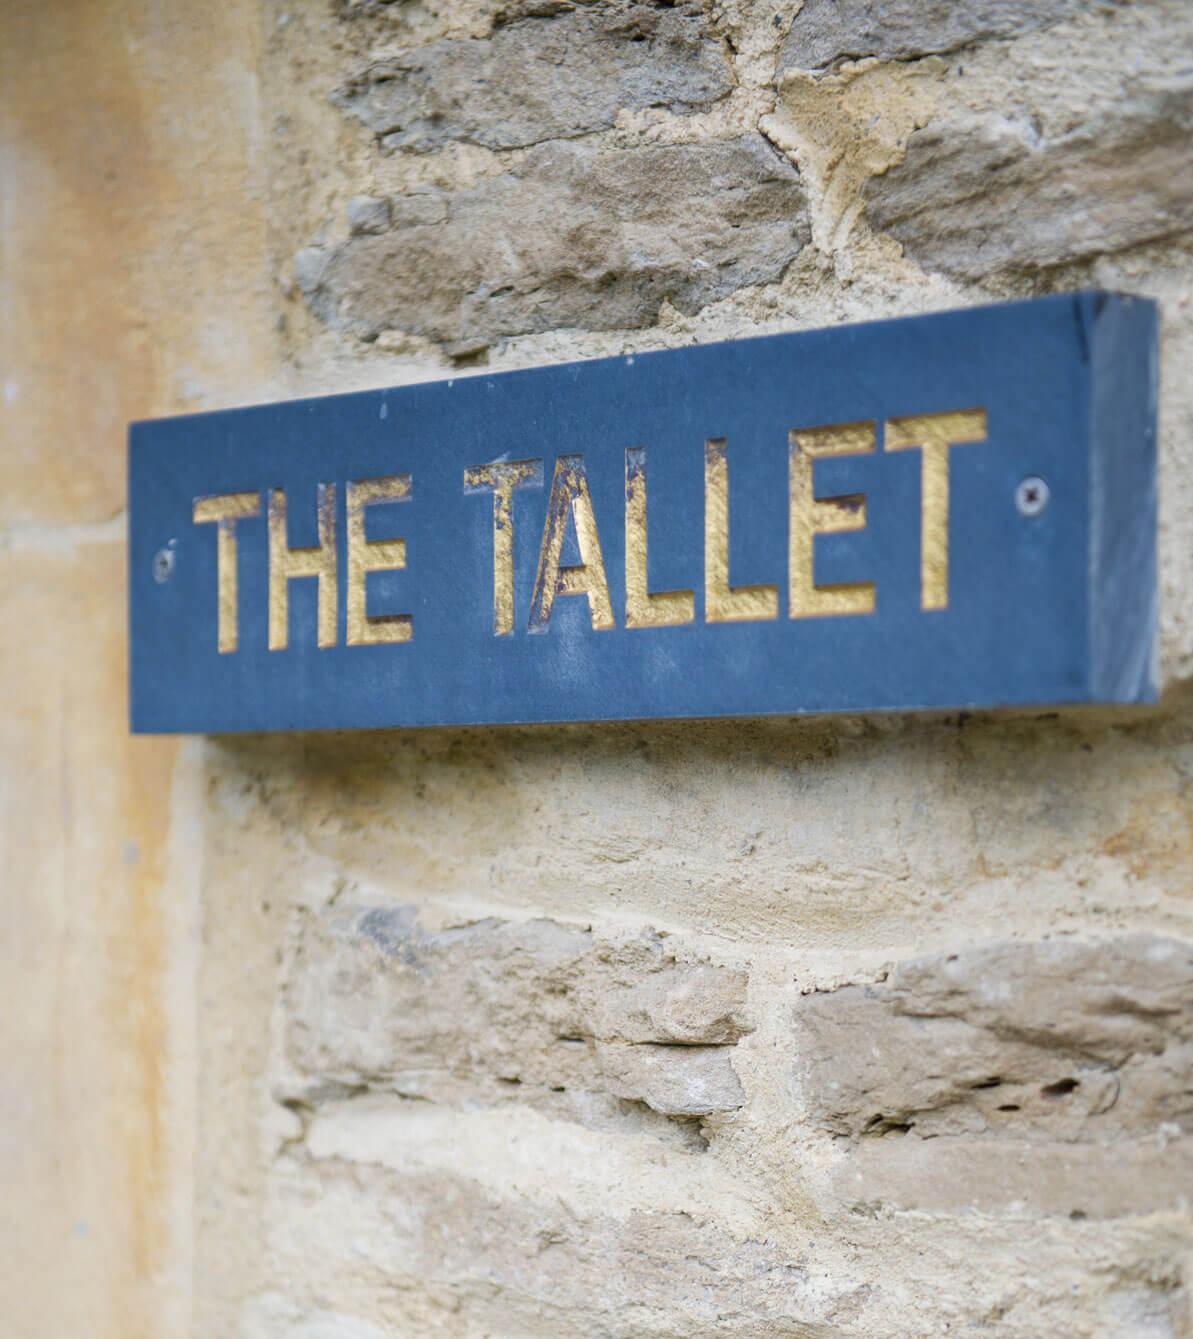 thyme southrop, thyme at southrop, thyme at southrop manor, thyme house southrop, thyme southrop manor, thyme hotel southrop, thyme hotel, thyme house, thyme house cotswolds, thyme hotel cotswolds, thyme uk